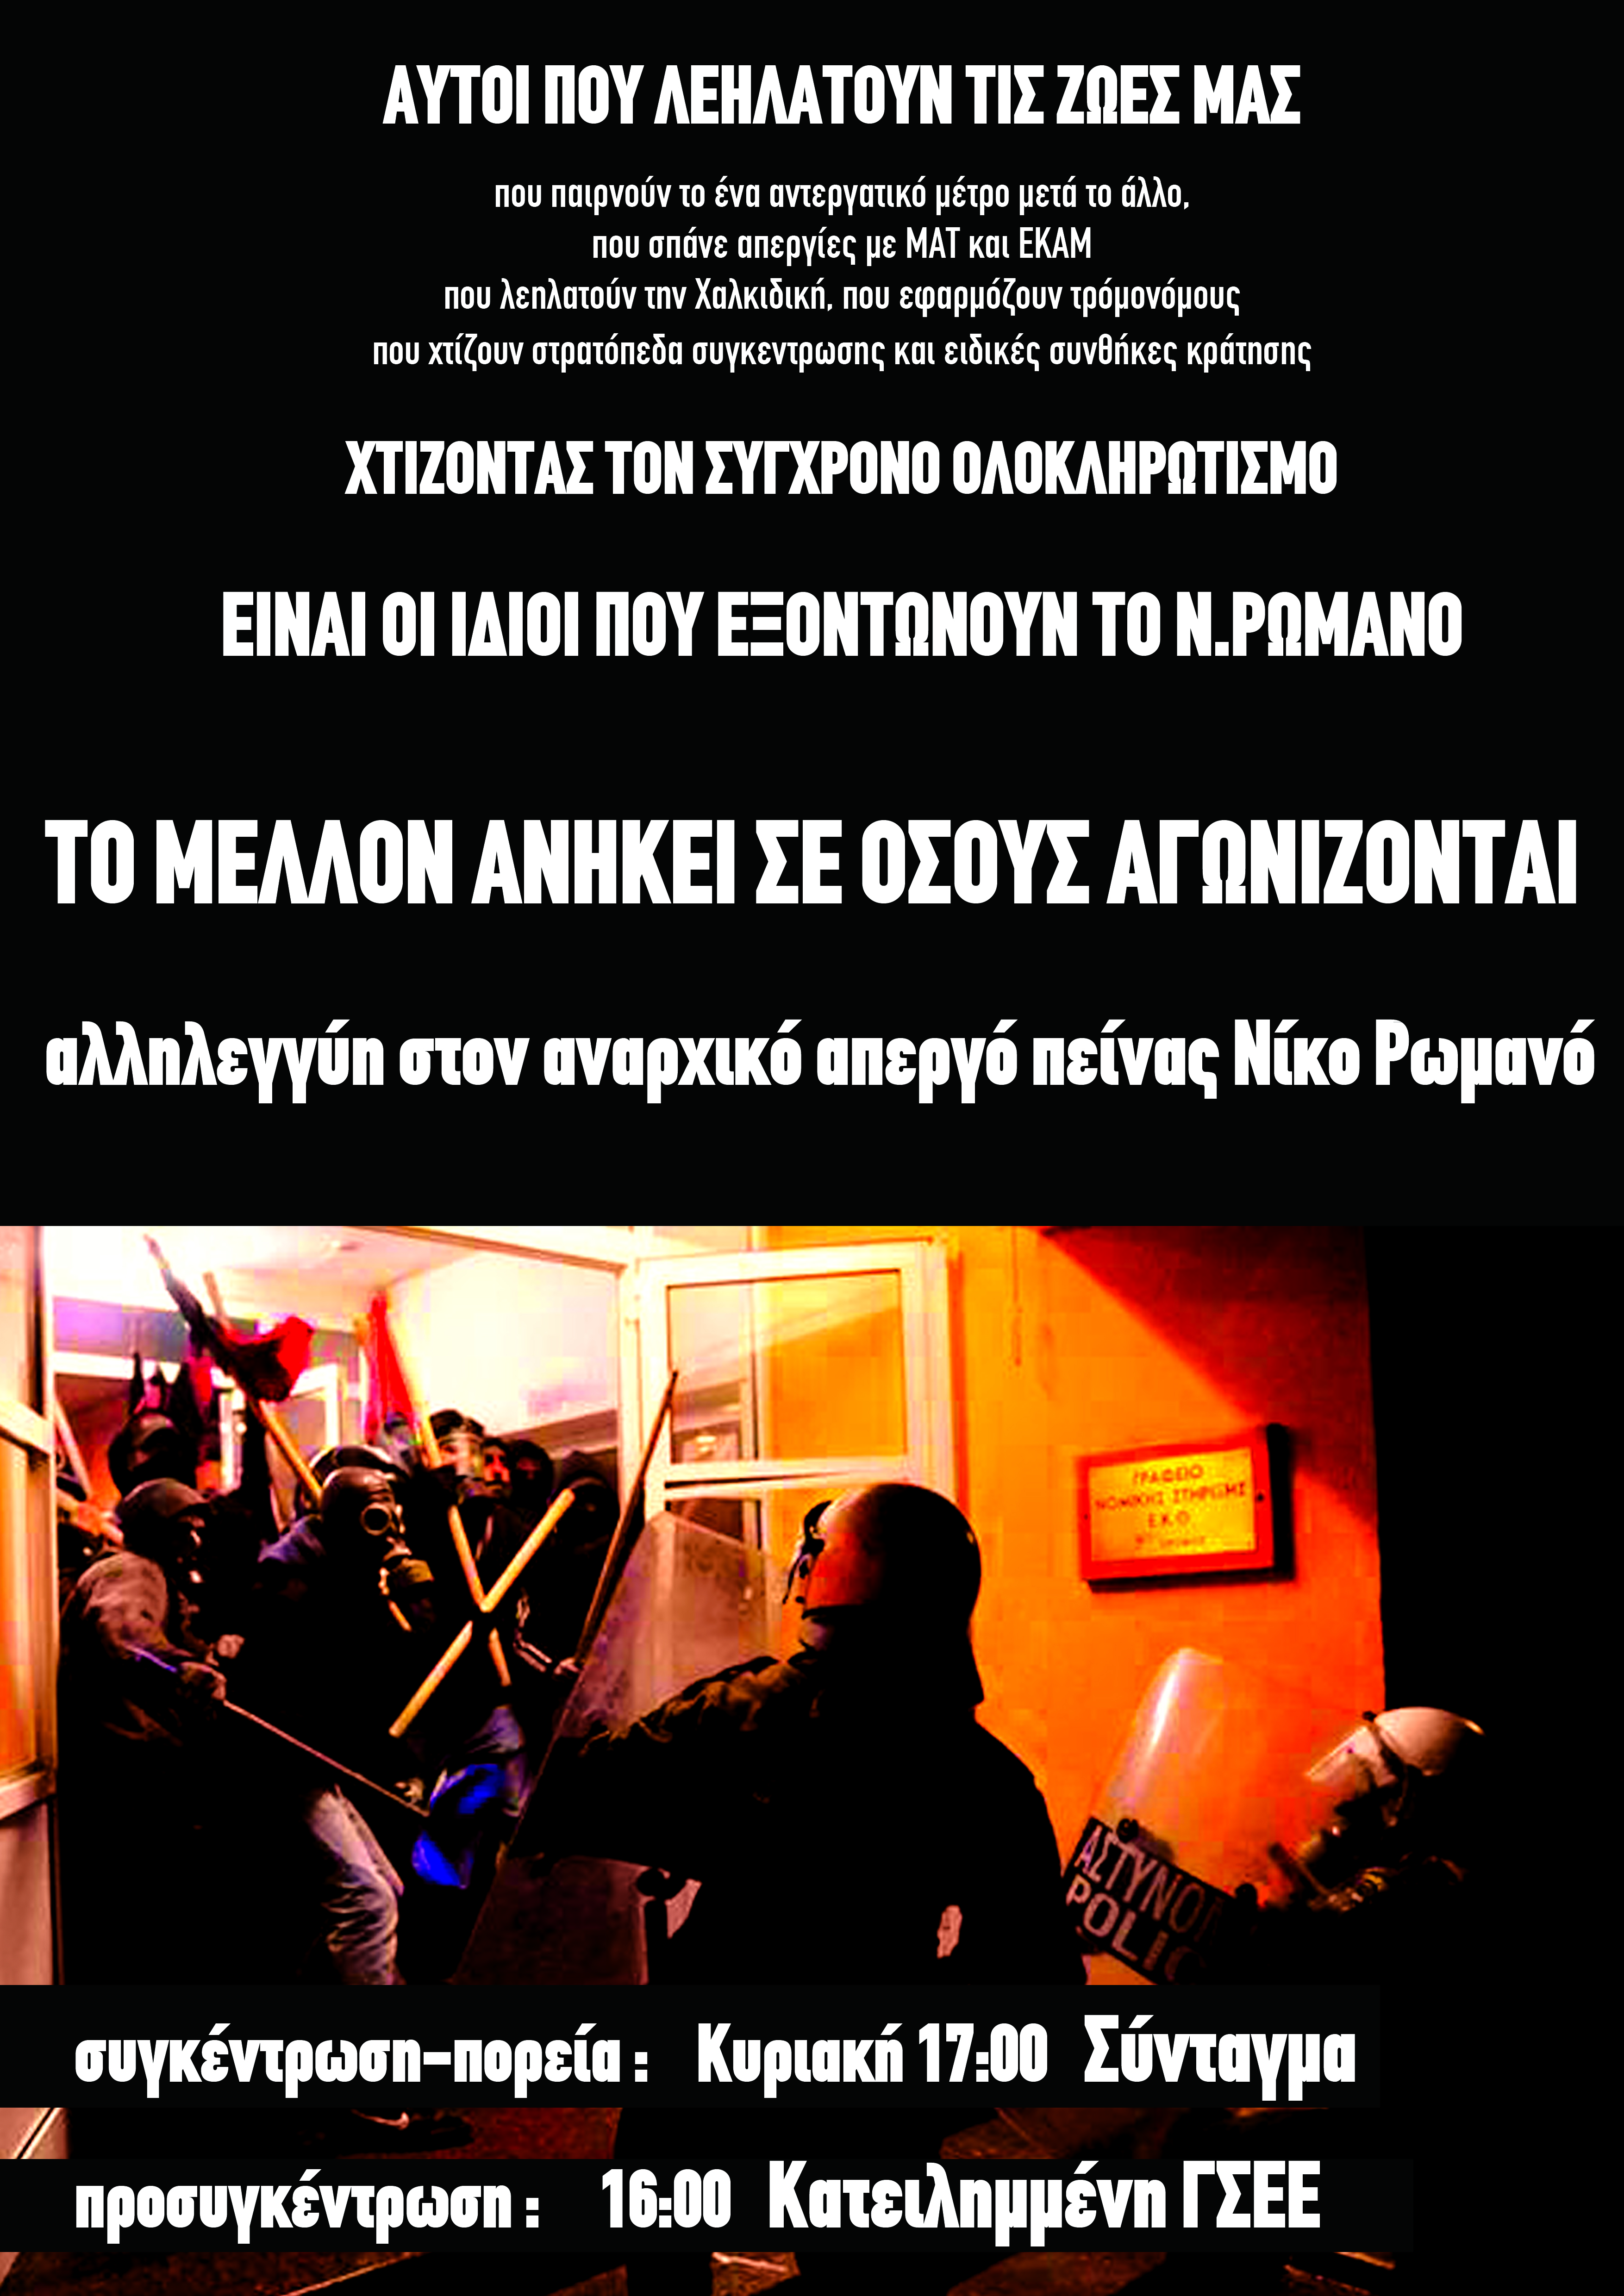 Affiche pour Nikos Romanos